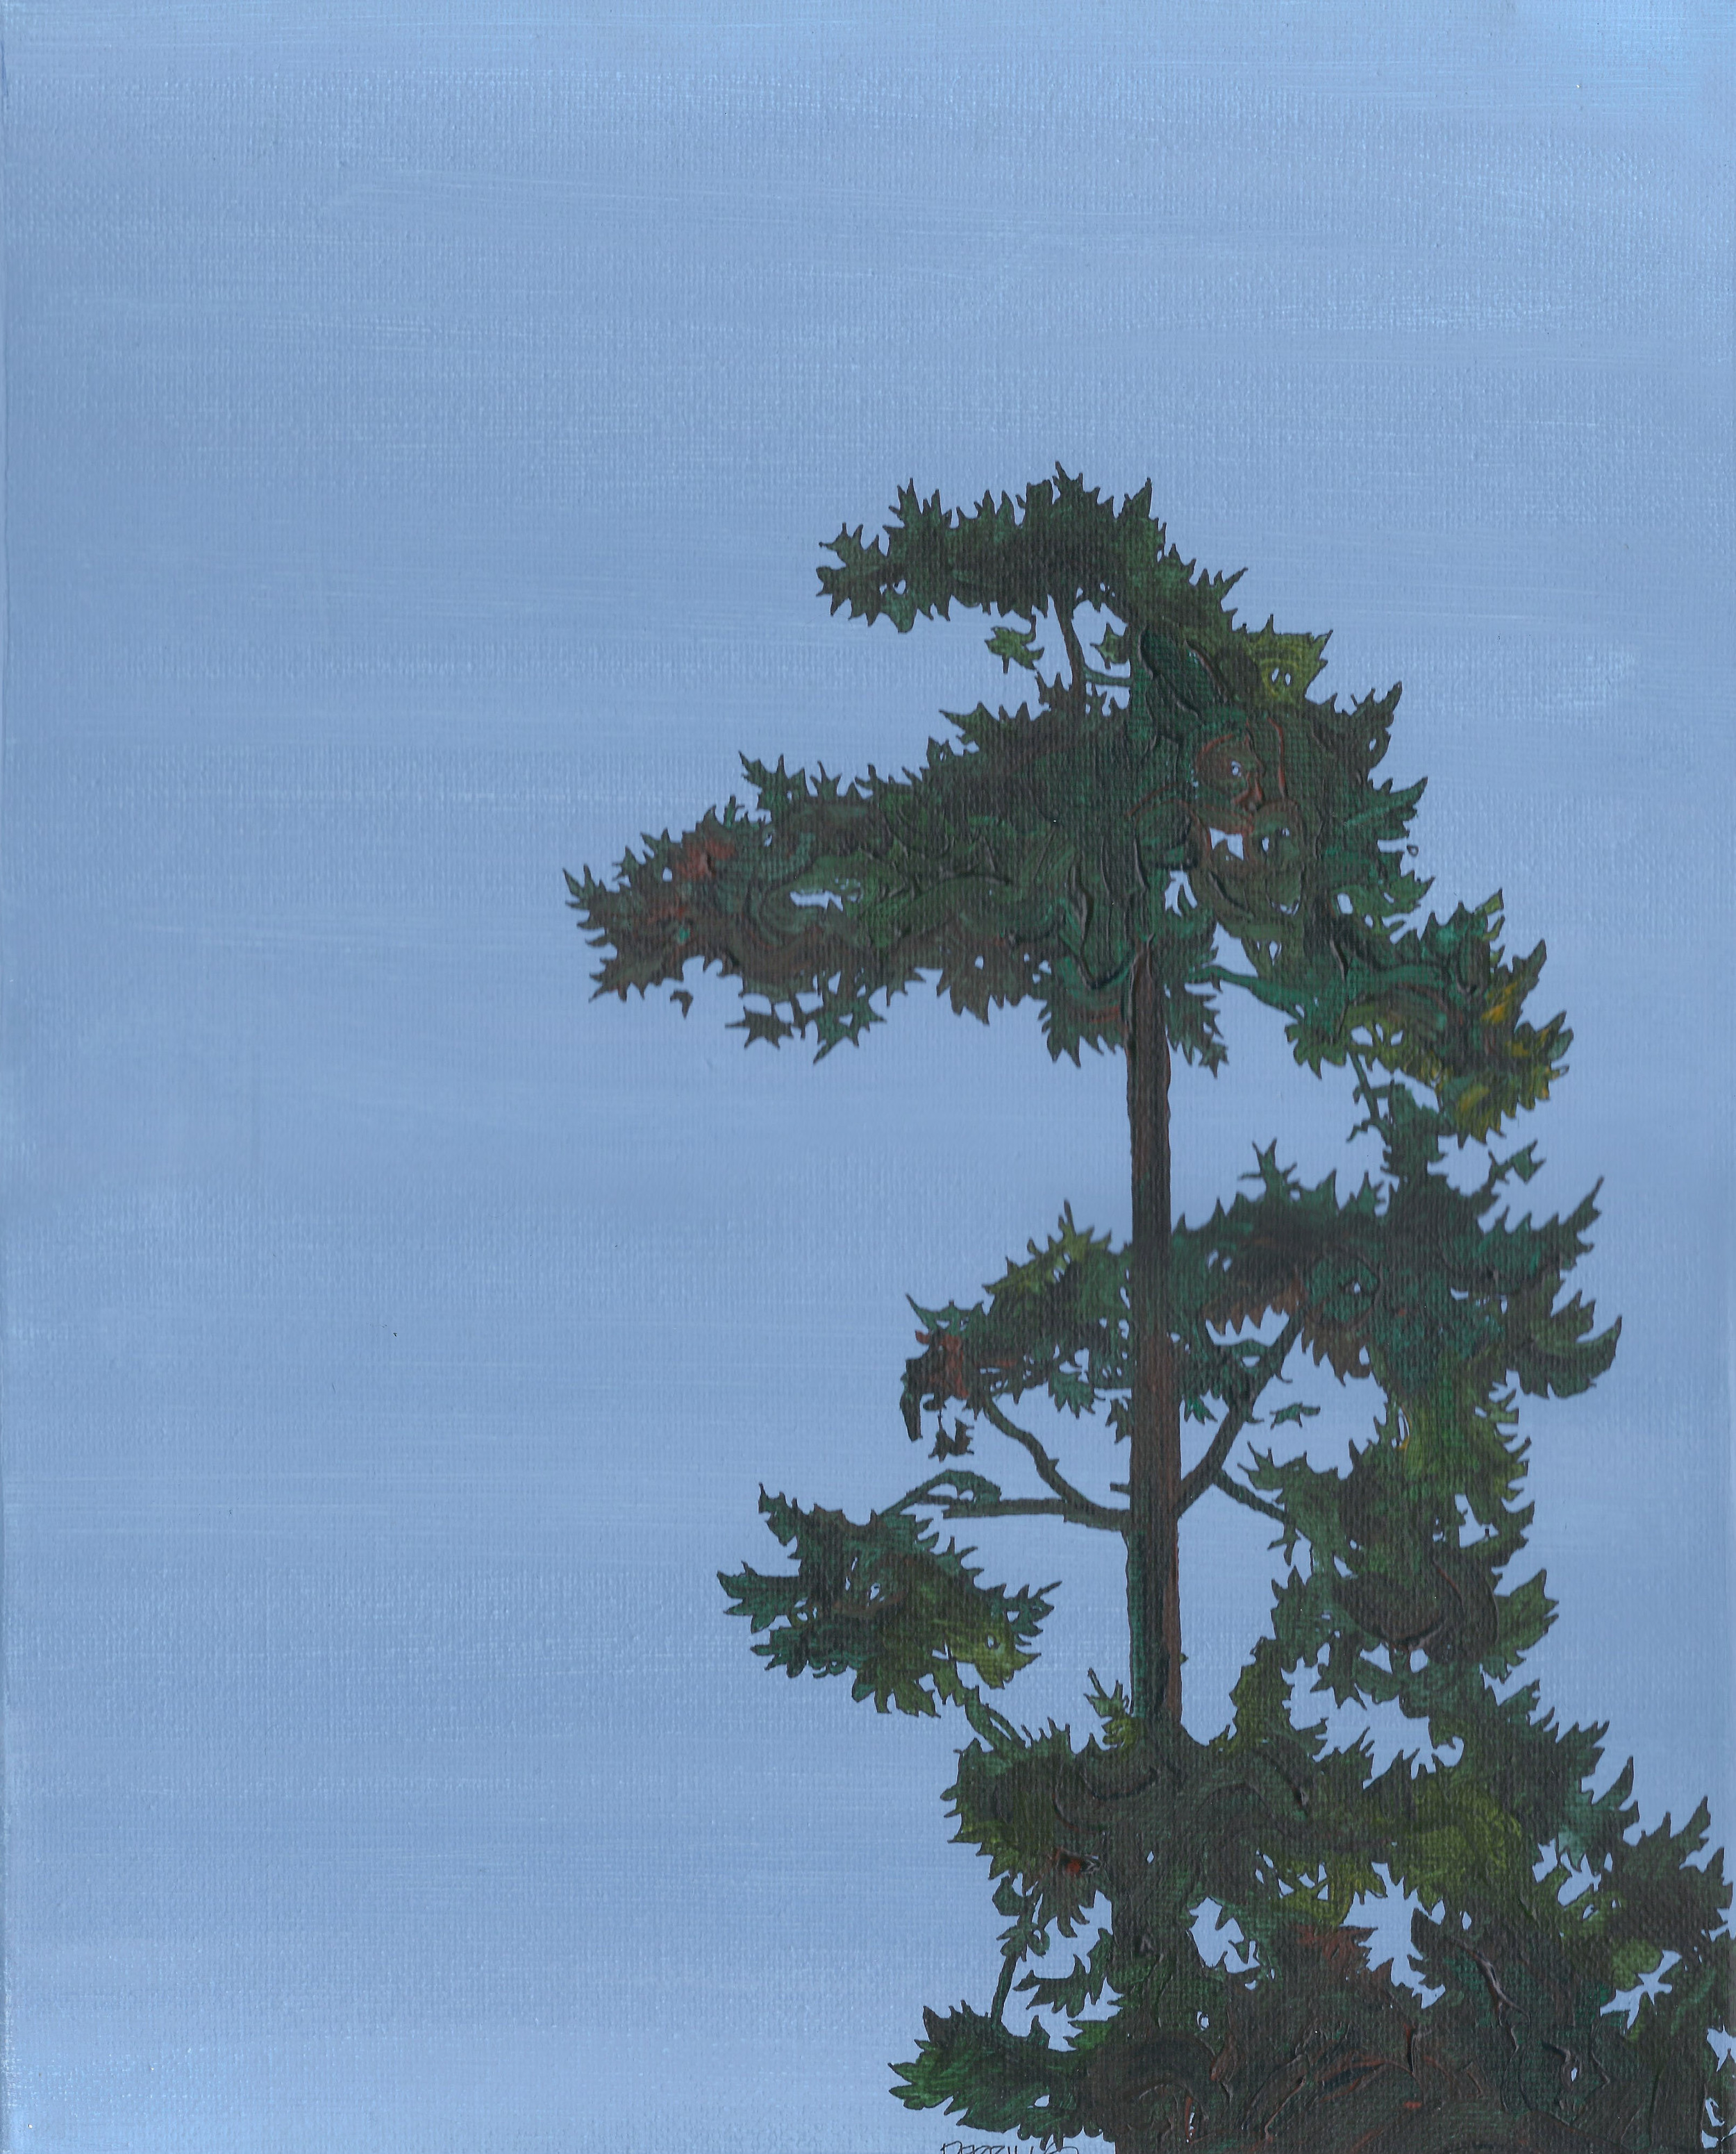 Fred Eaglesmith Tree-6514195035.jpg